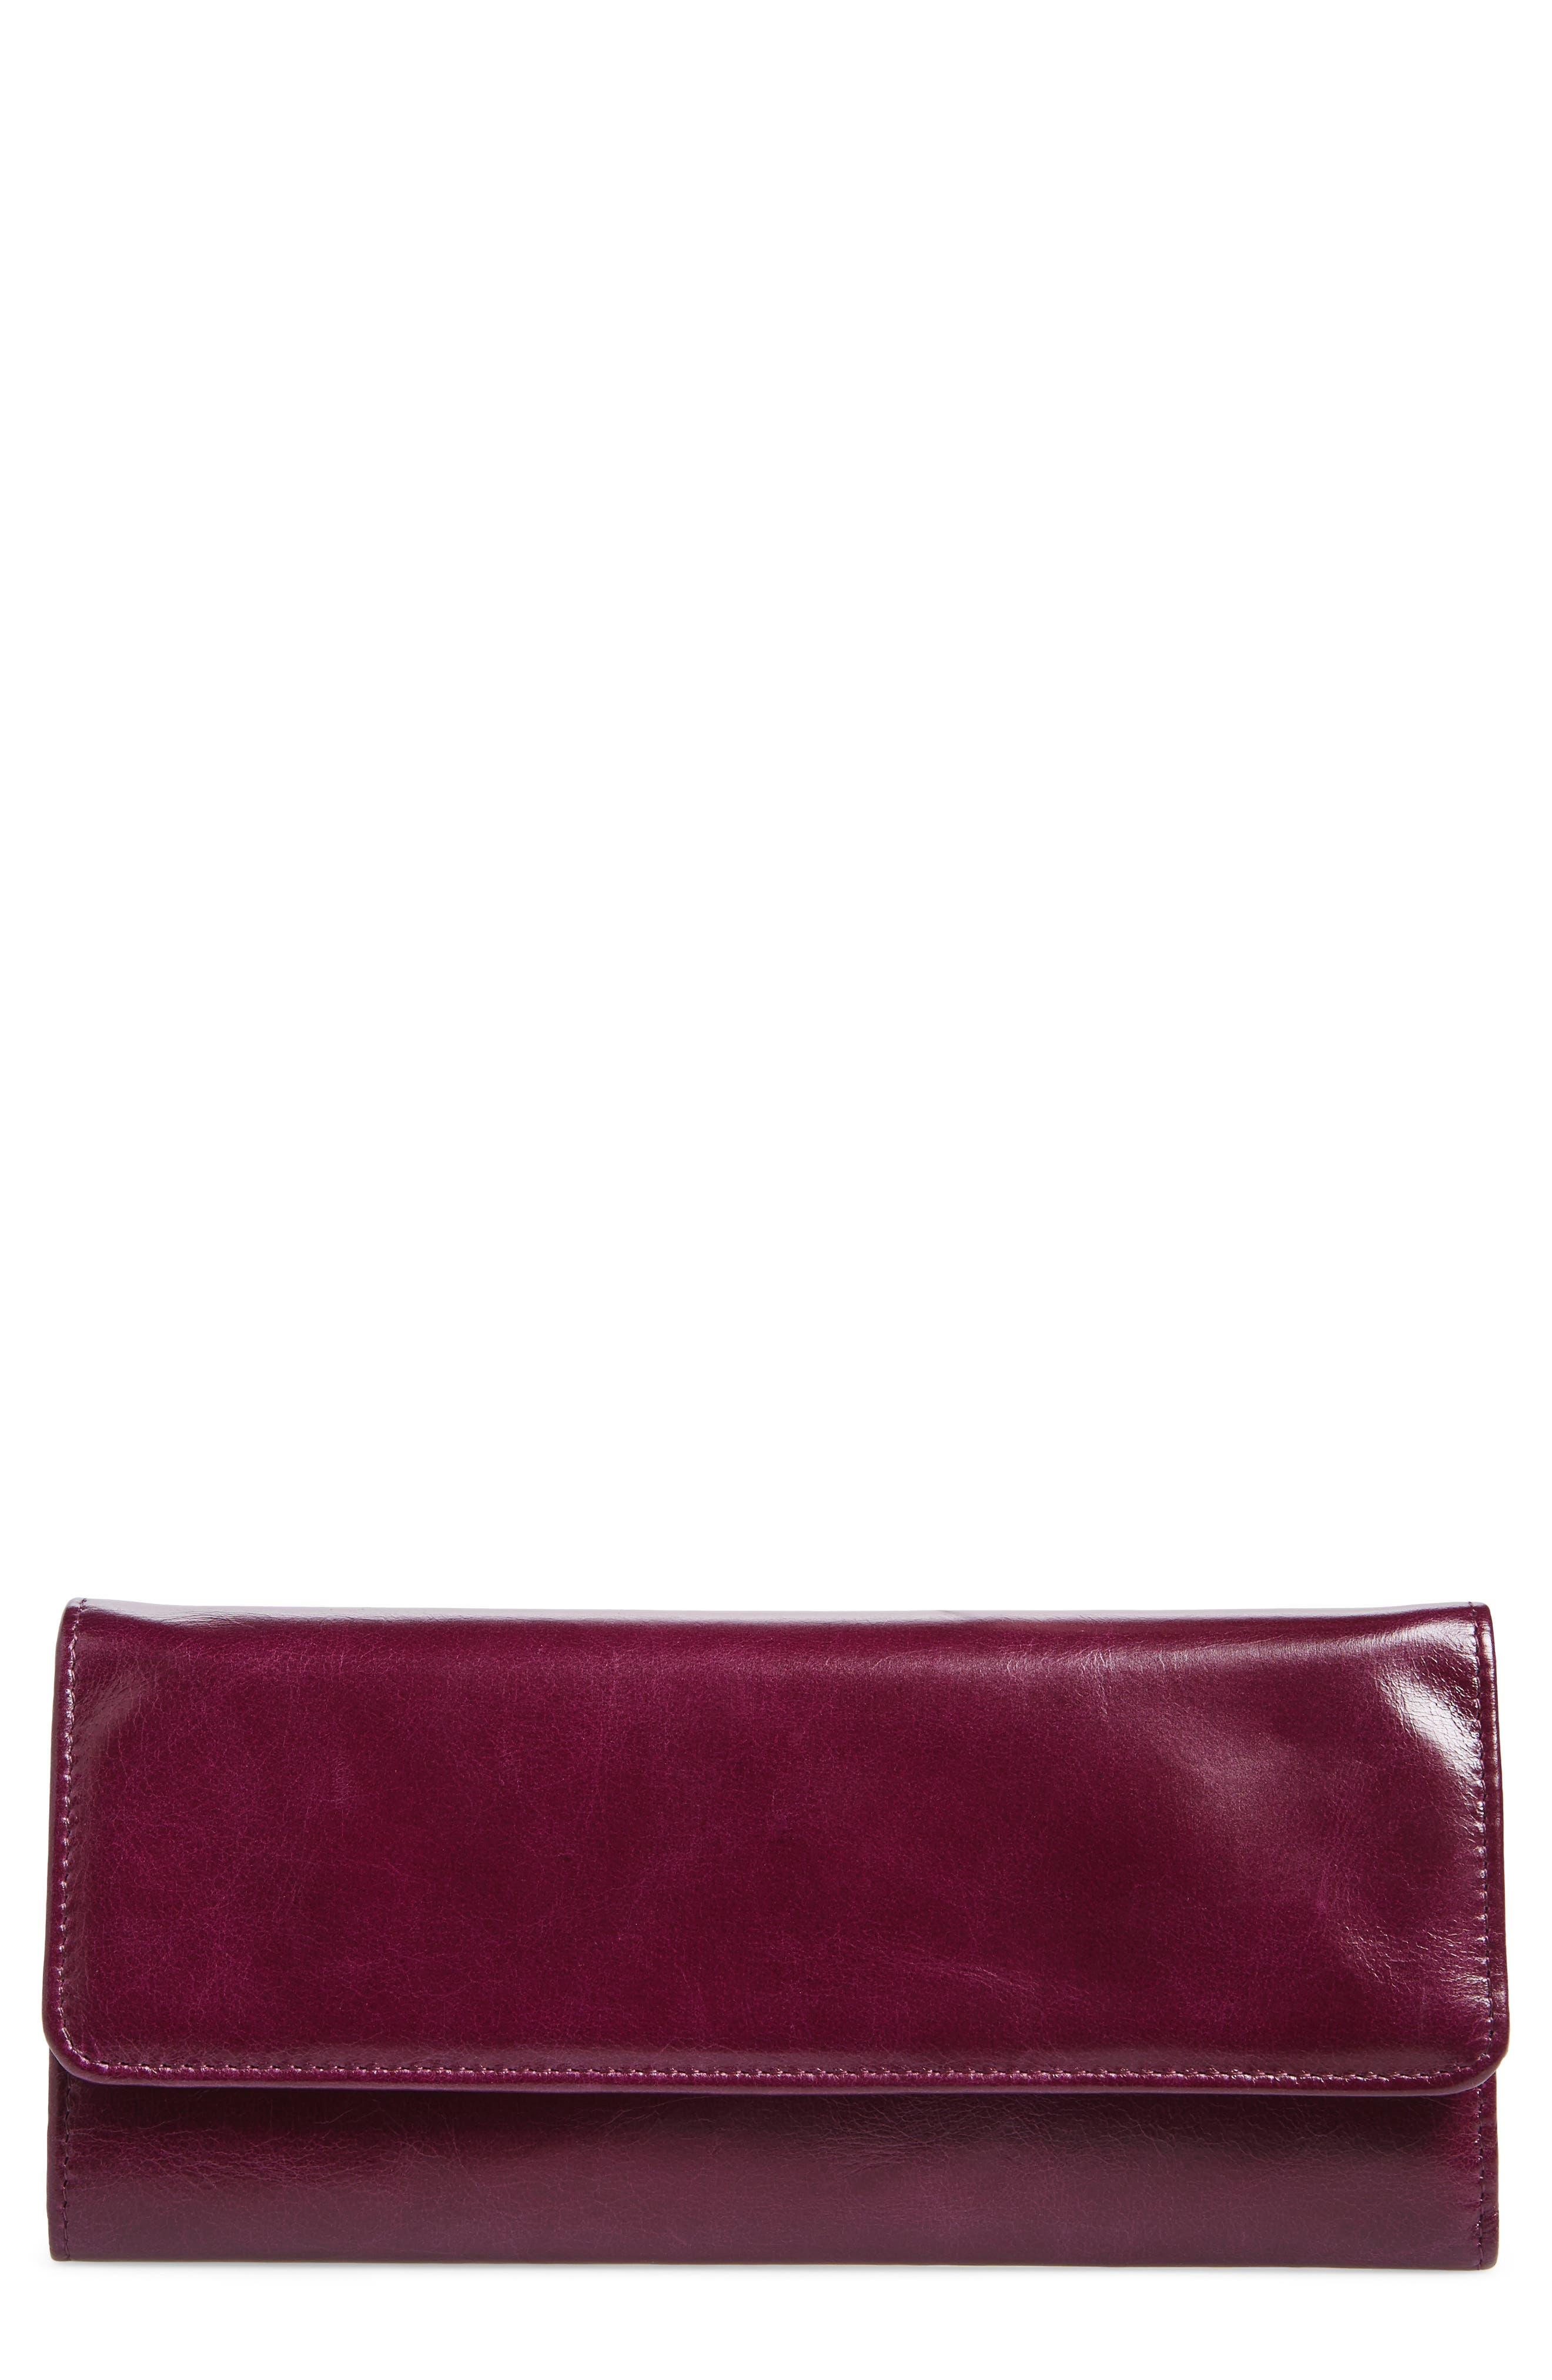 'Sadie' Leather Wallet,                             Main thumbnail 8, color,